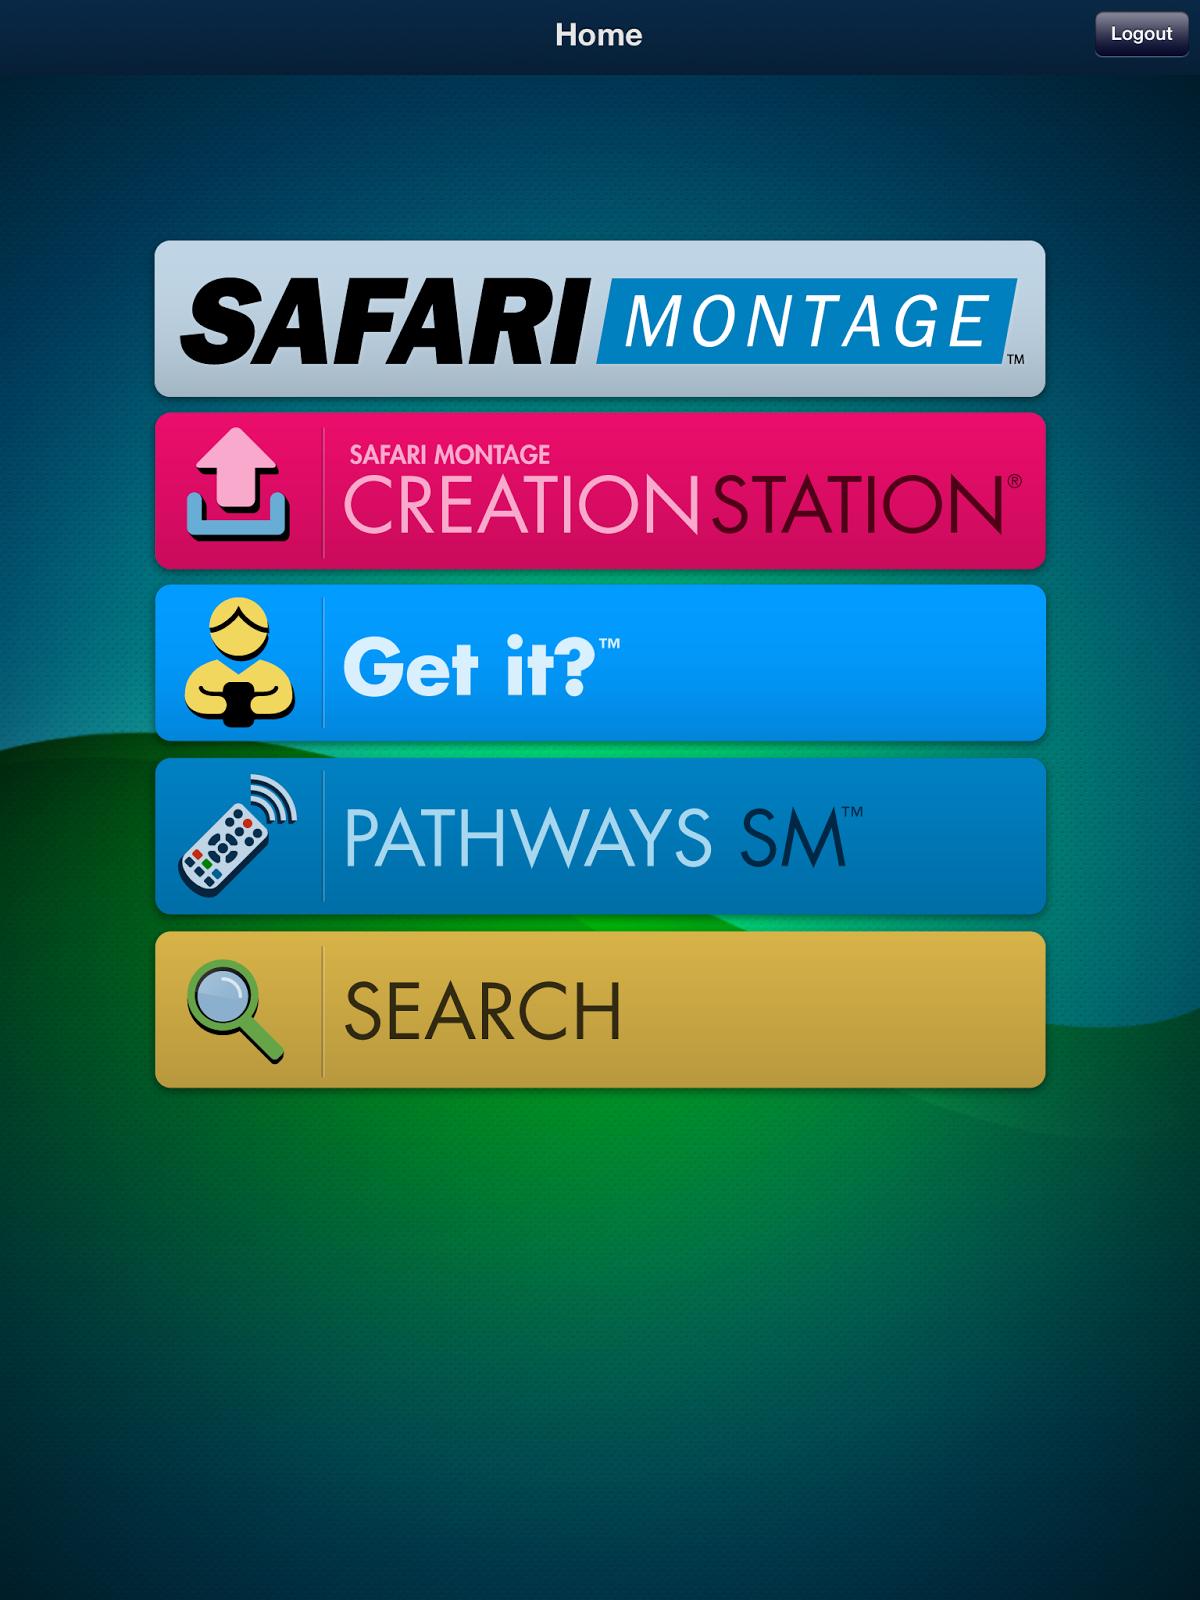 Motegoe app